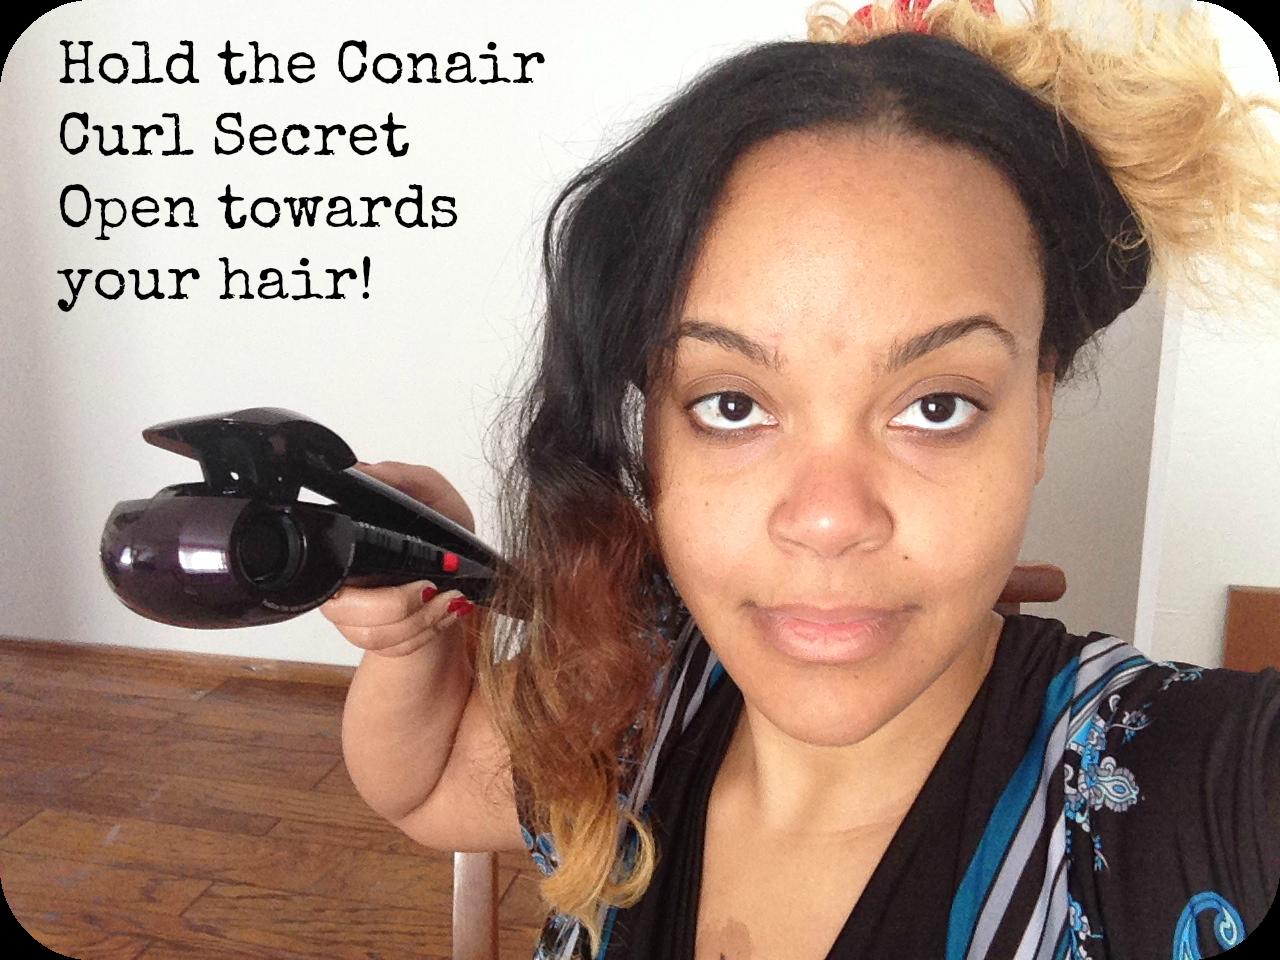 Conair Curl Secret Open #shop CBG191310 Classy Black Girl